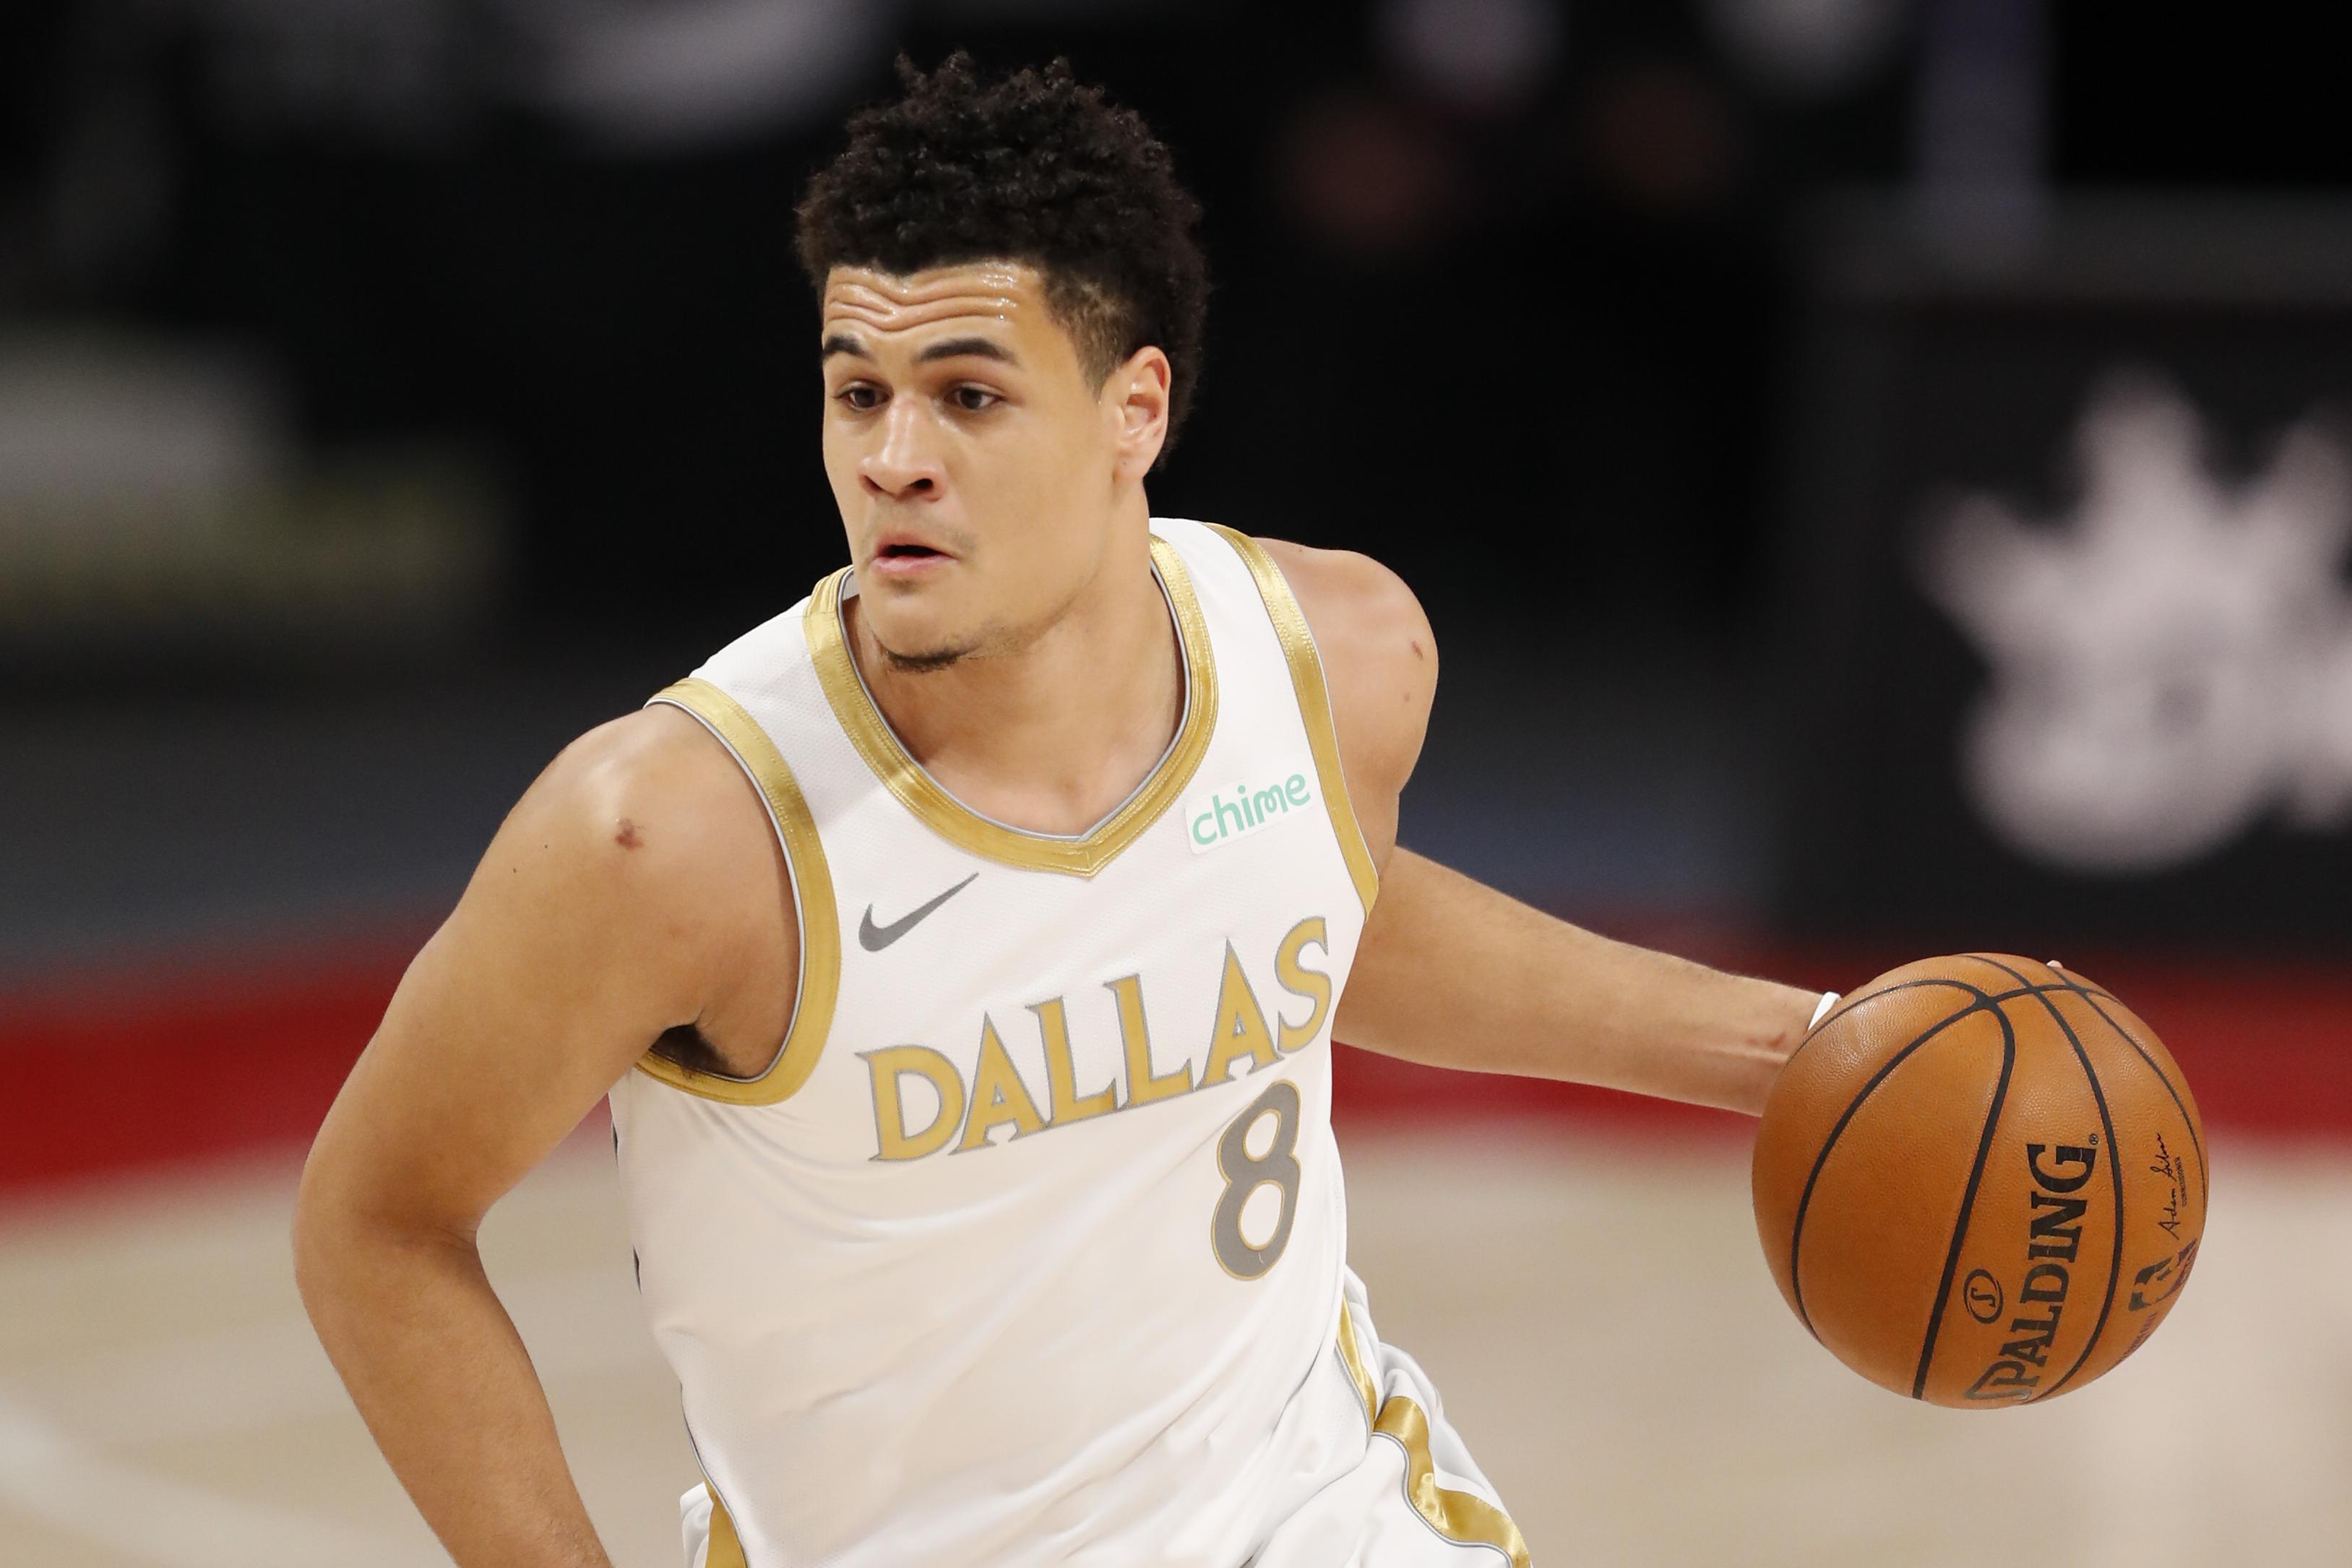 NBA: Dallas Mavericks at Detroit Pistons